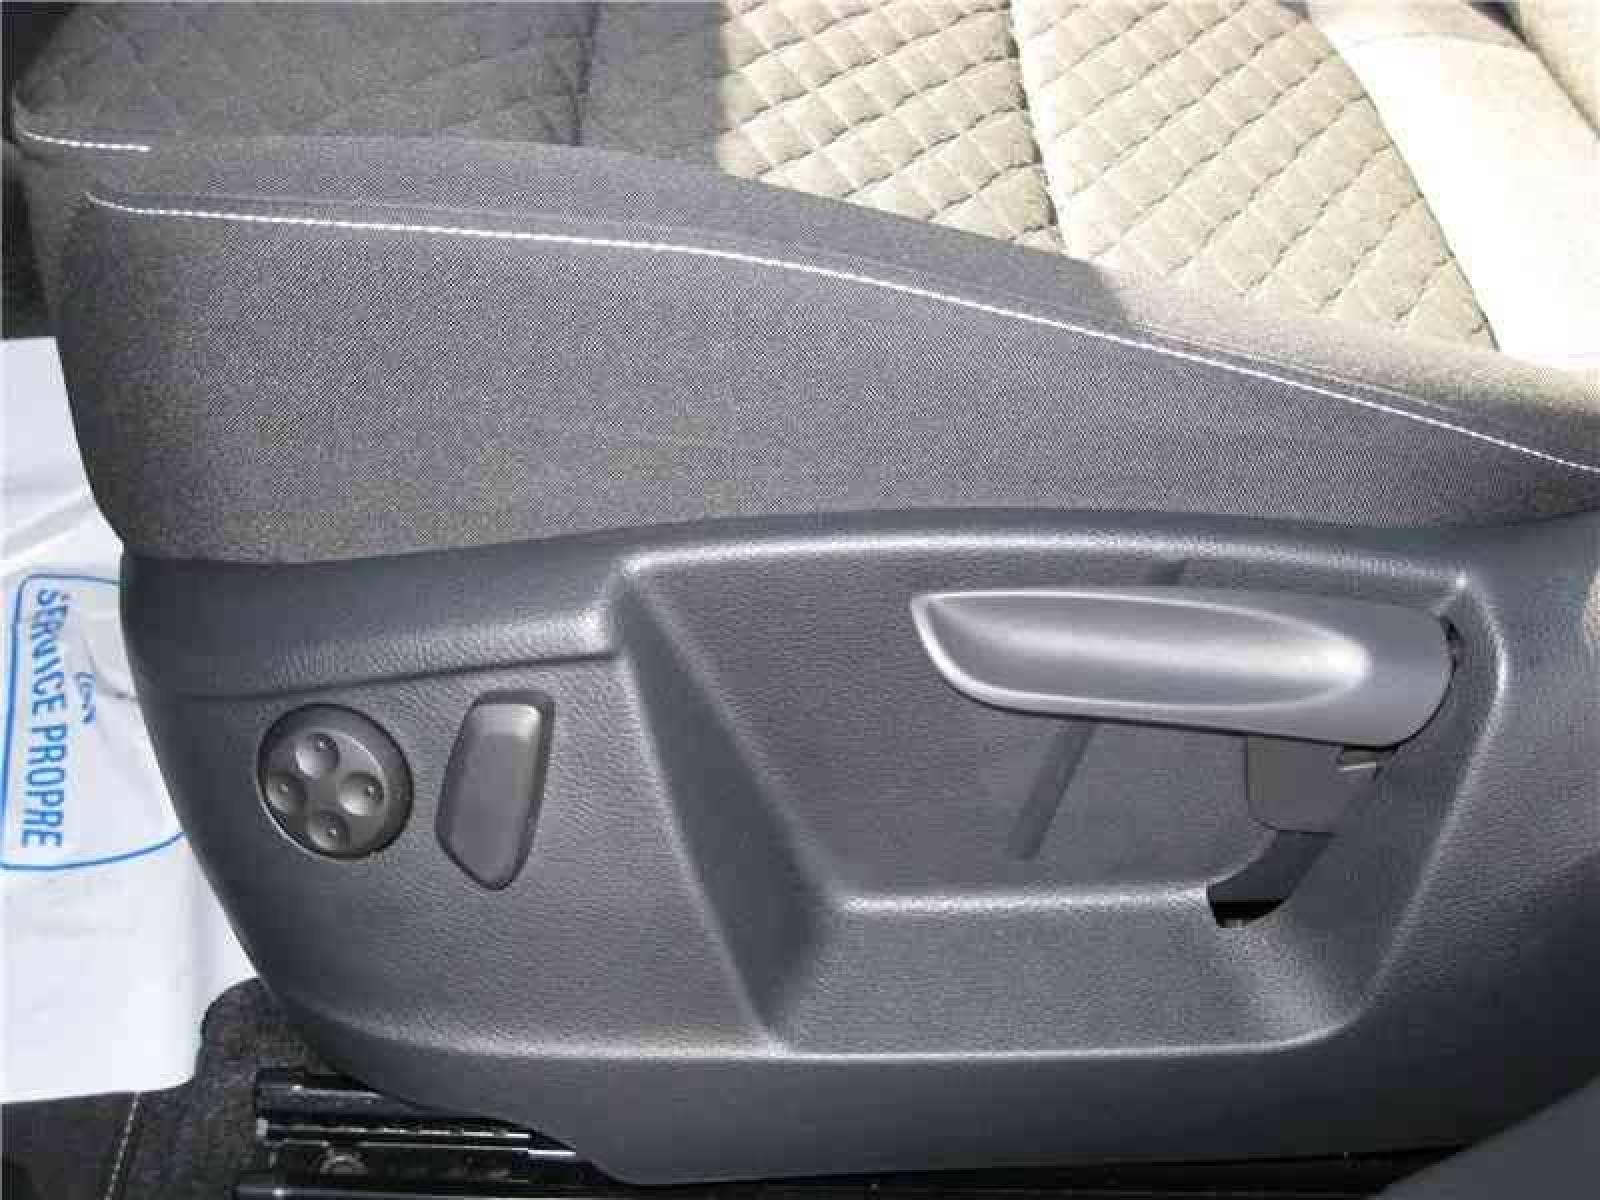 VOLKSWAGEN Sharan 2.0 TDI 150 BlueMotion Technology DSG6 - véhicule d'occasion - LEMAUVIEL AUTOMOBILES - Présentation site web V2 - Lemauviel Automobiles - VIRE - 14500 - VIRE - 9